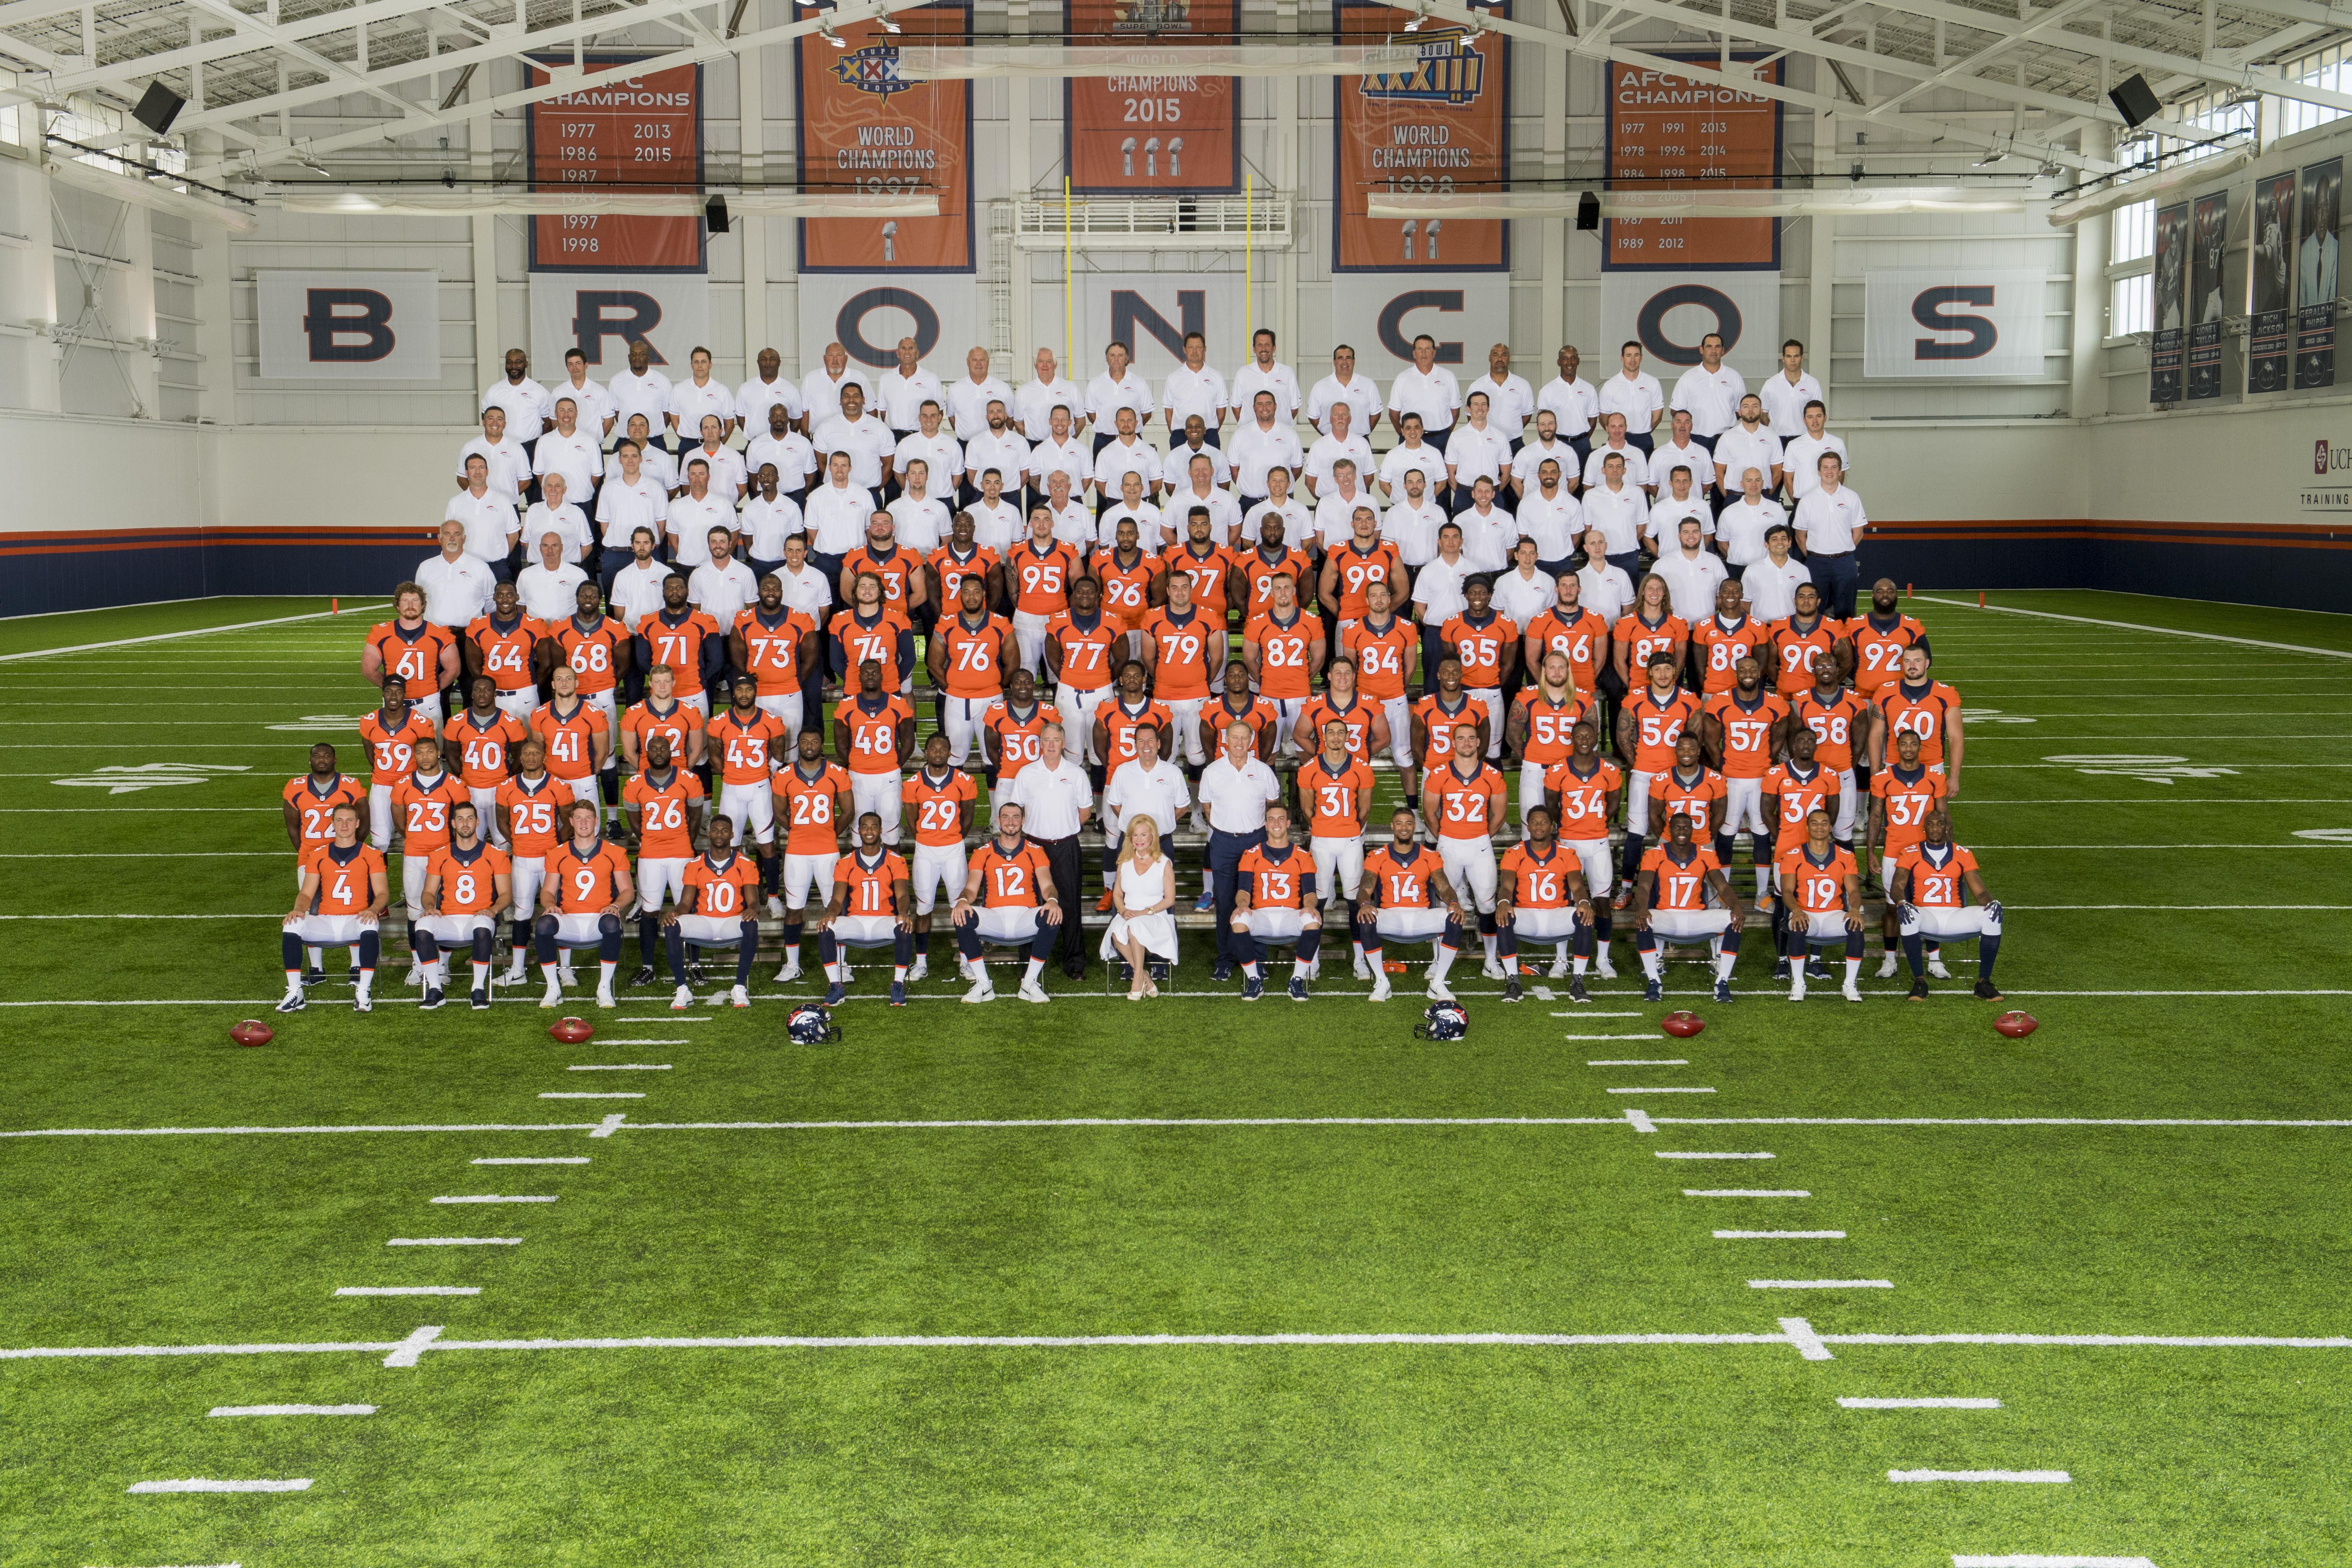 Photo: AC Broncos Survey